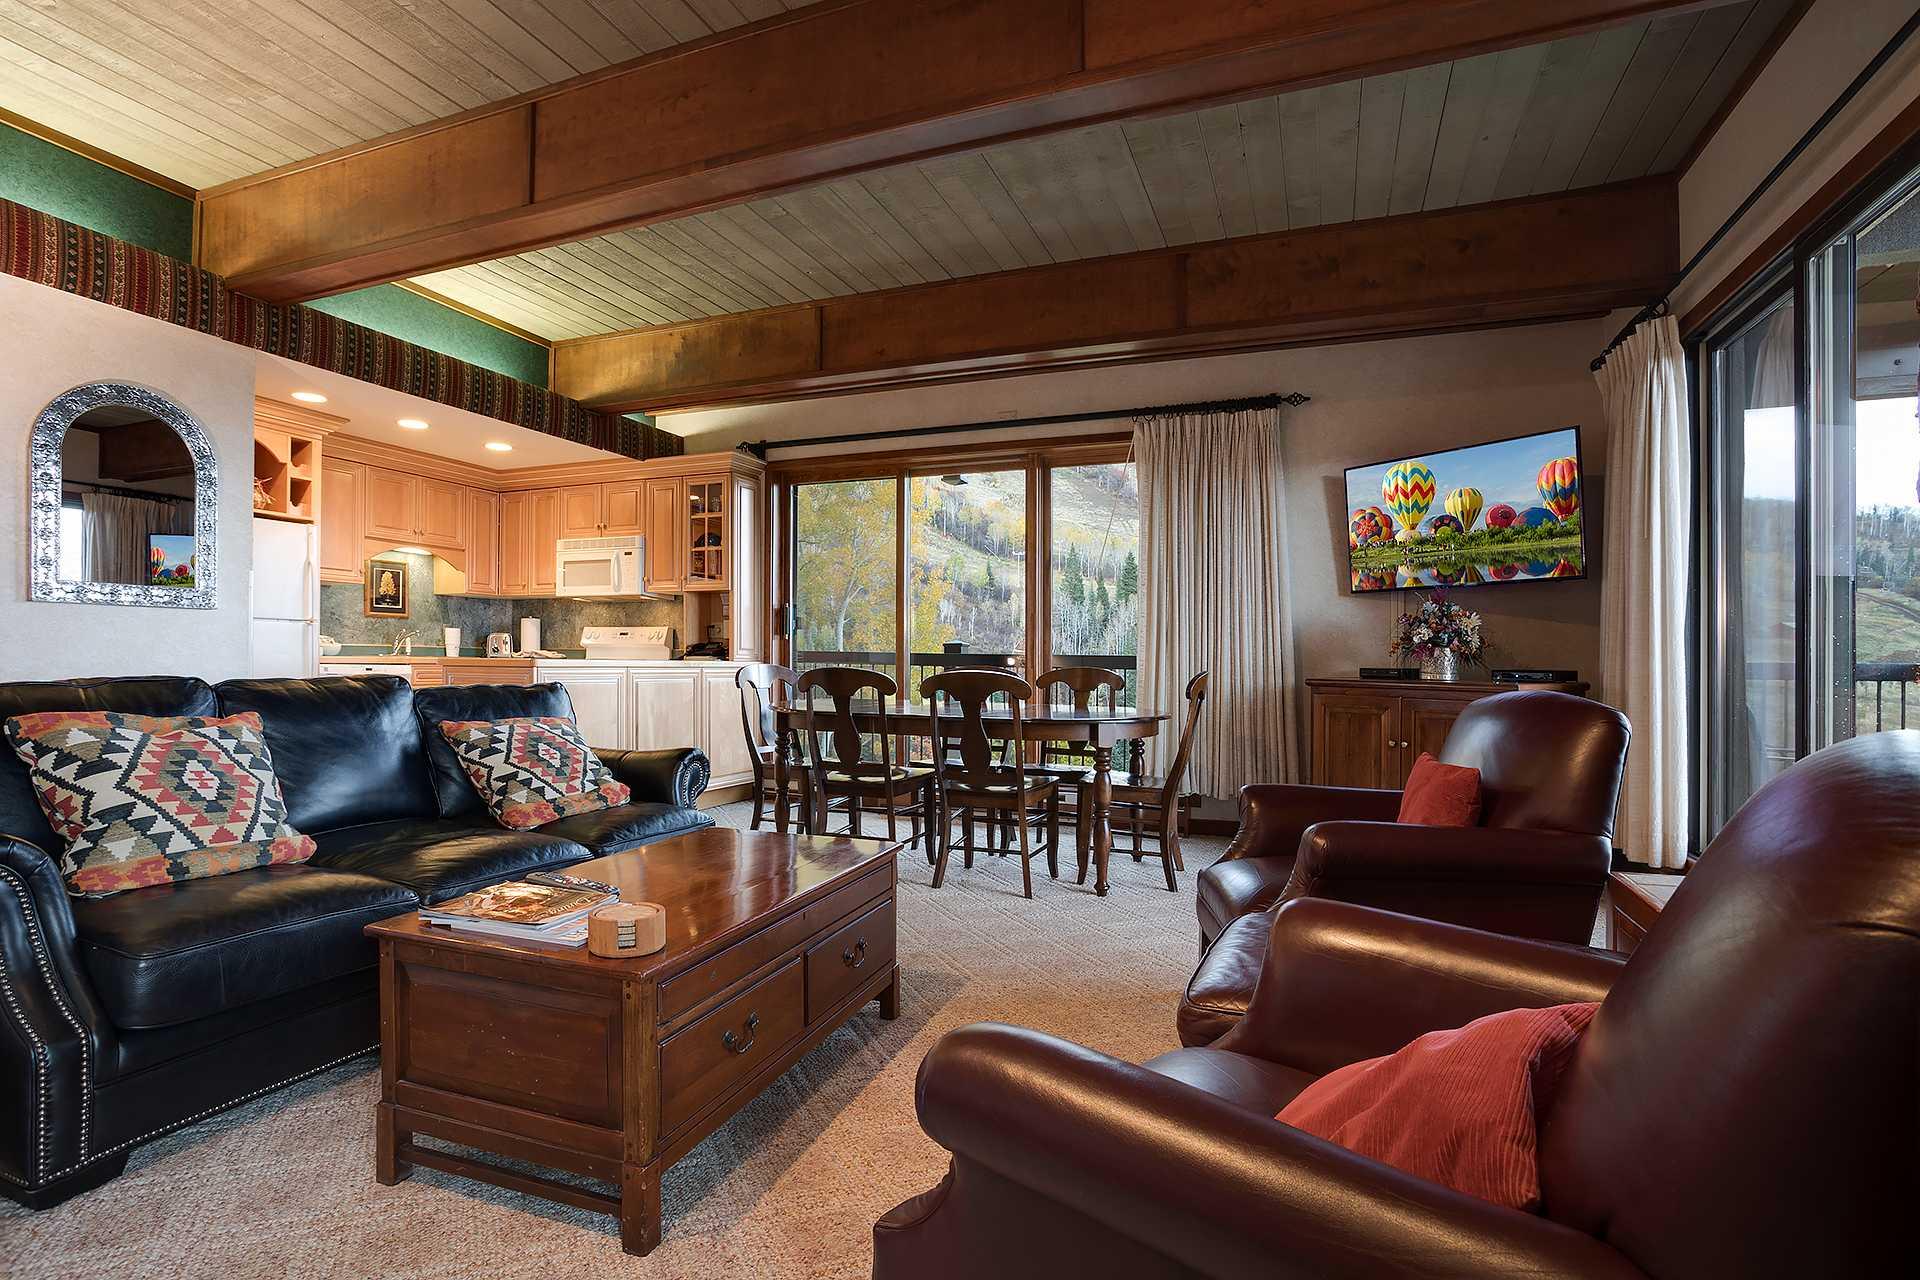 CA219: Storm Meadows Club A Condominiums